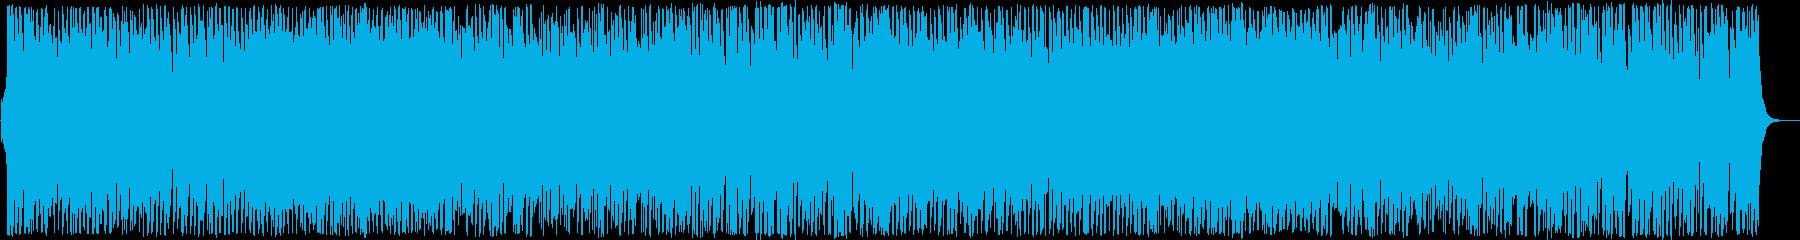 BGM_からくり戦闘曲の再生済みの波形